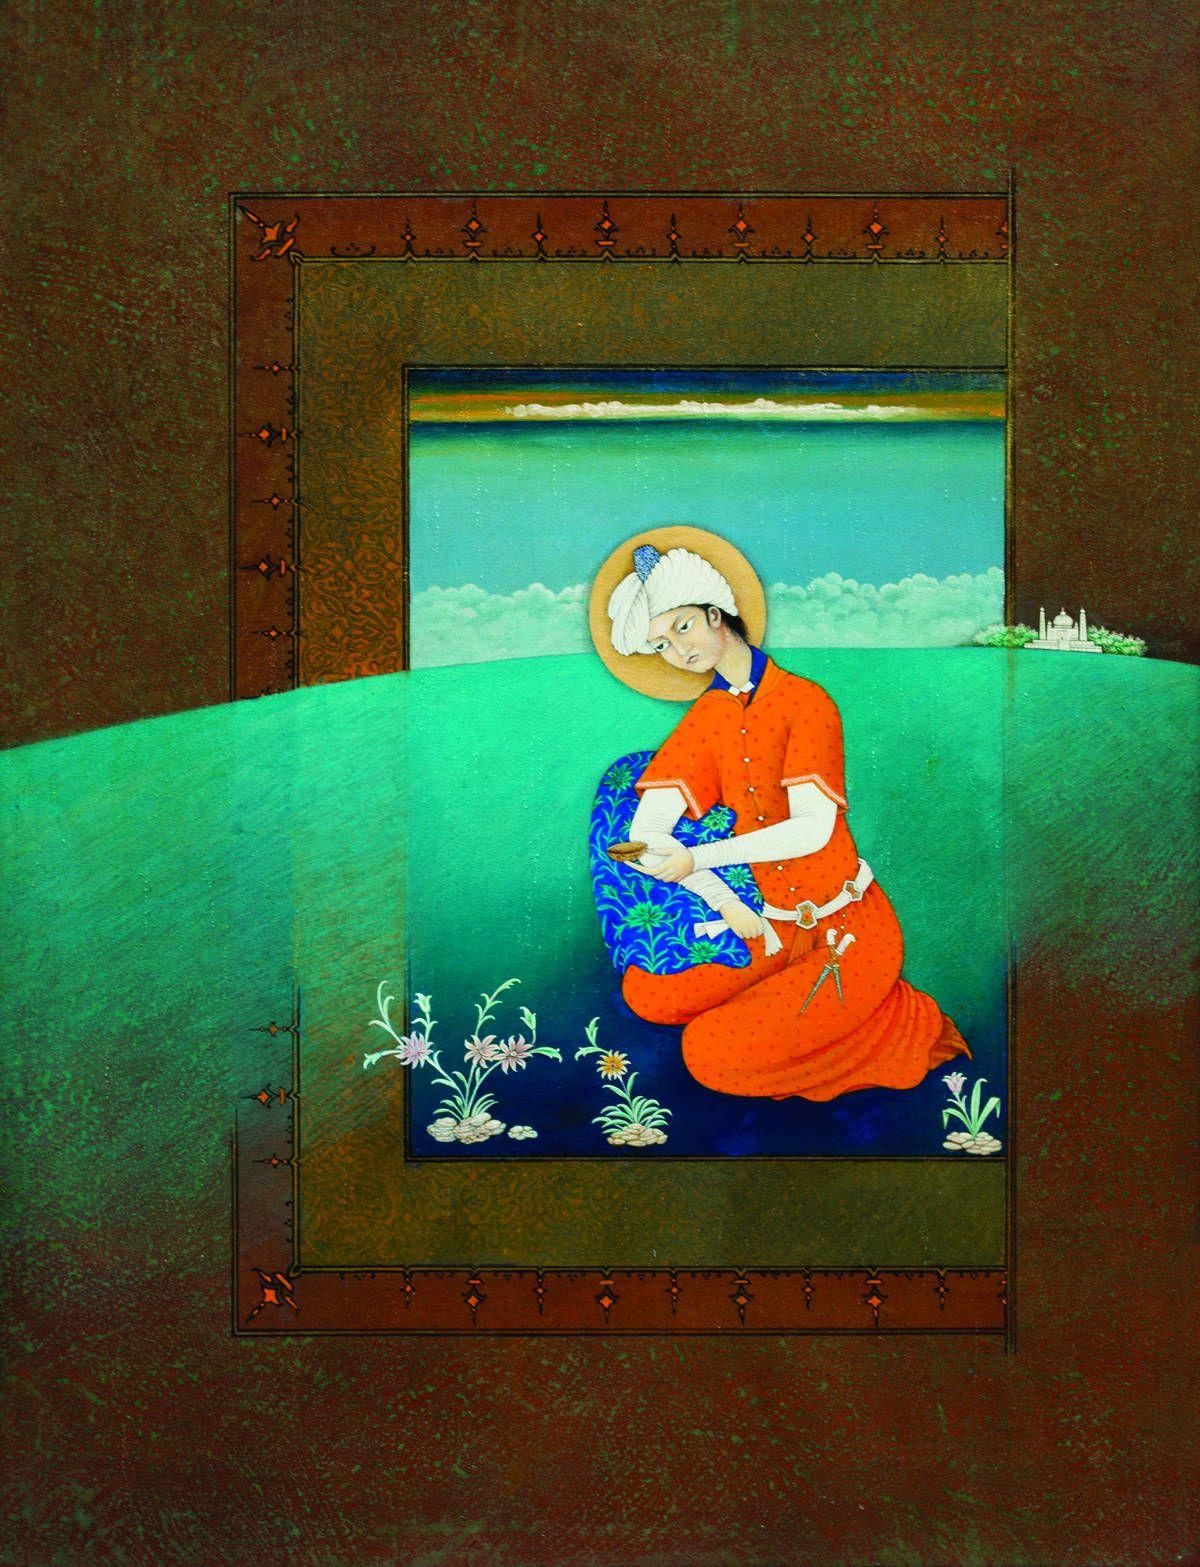 Bashir Ahmed Page 2 | Art, Art gallery, Miniature art